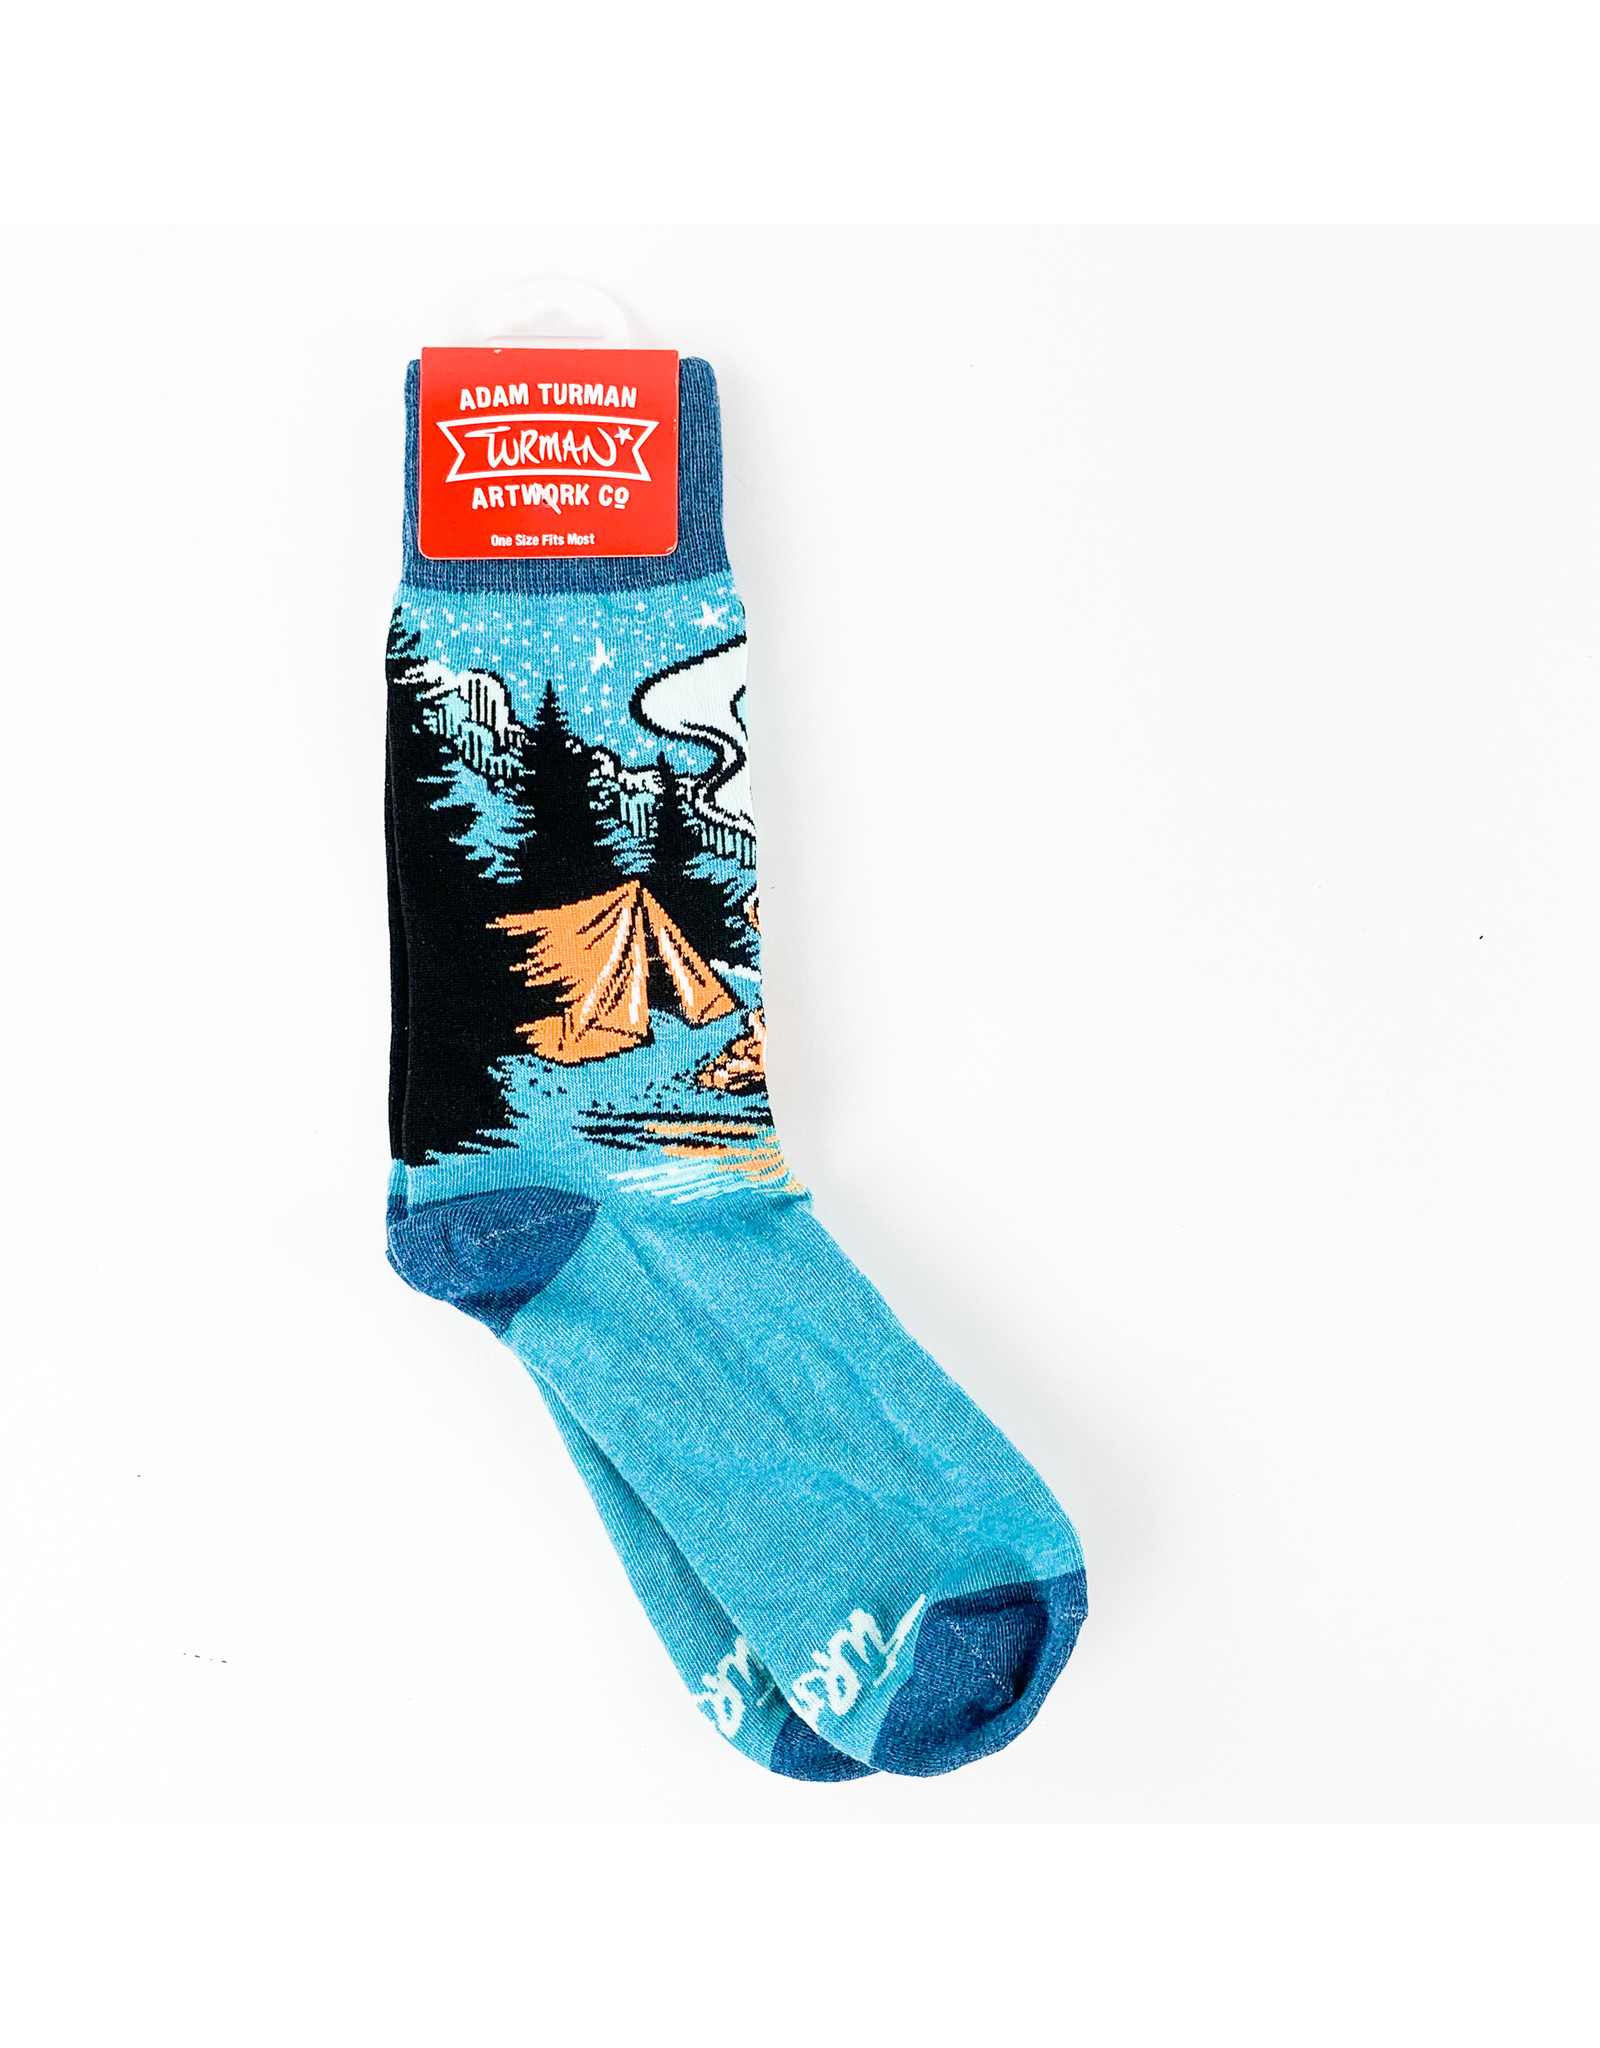 Truman Merch Co Campfire Socks